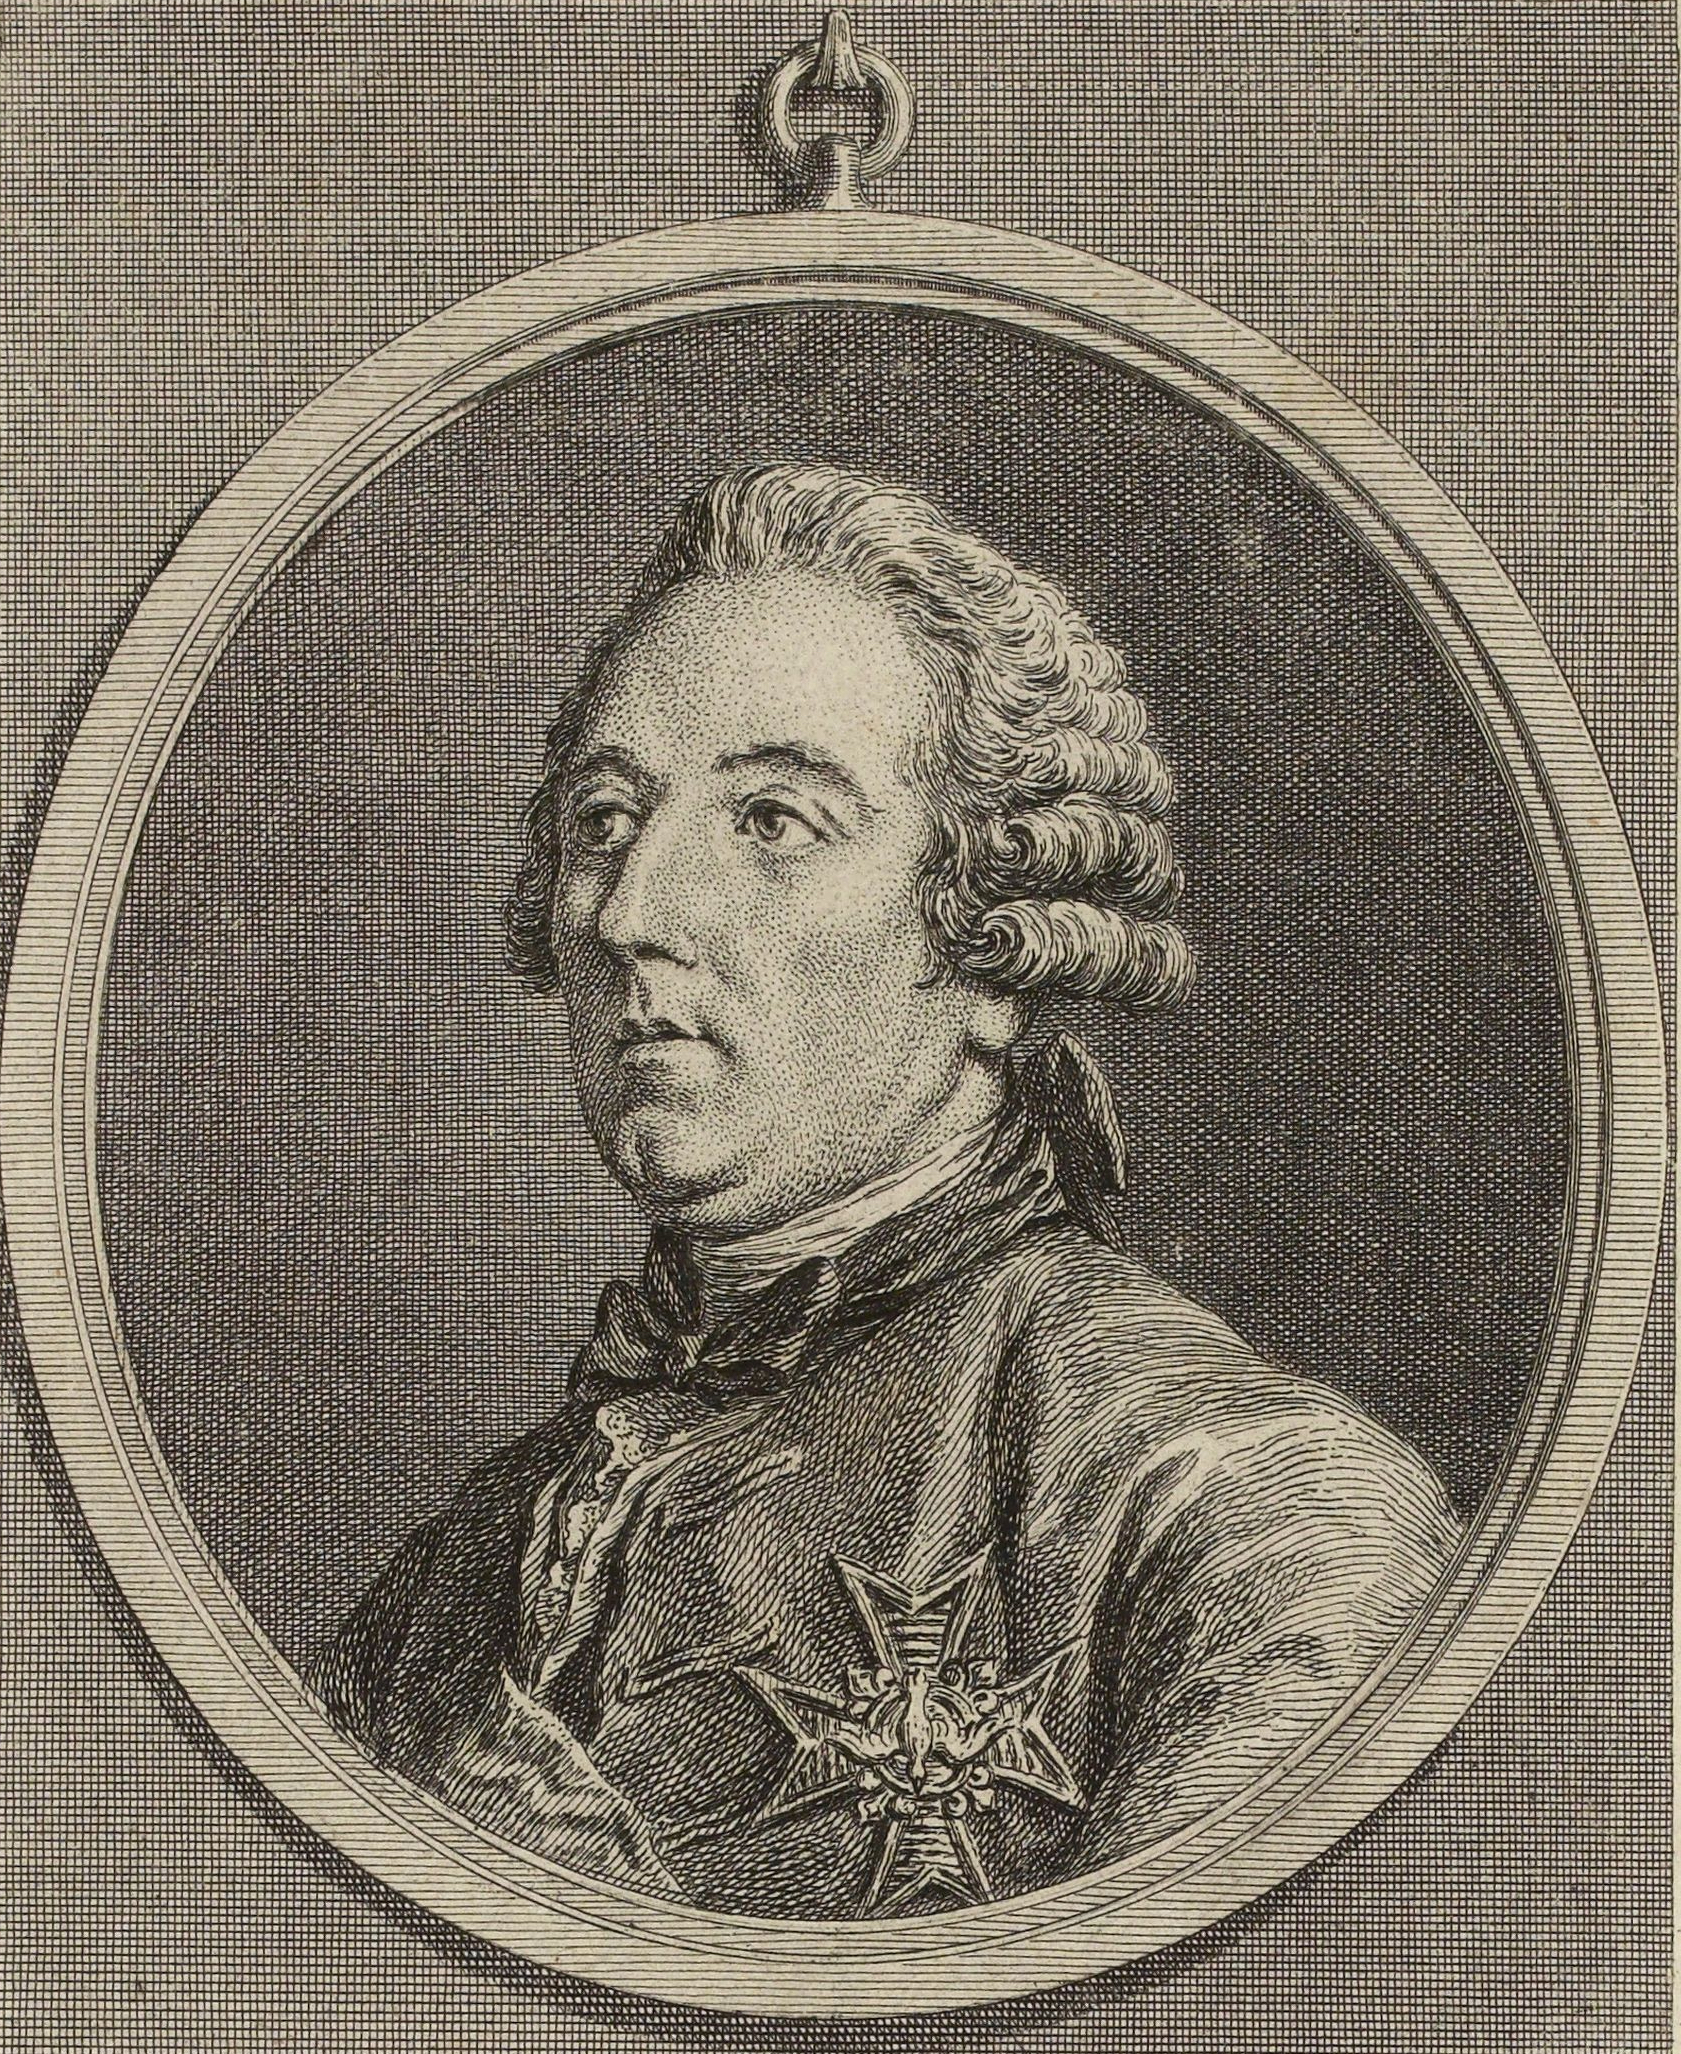 Portrait par Charles-Nicolas Cochin